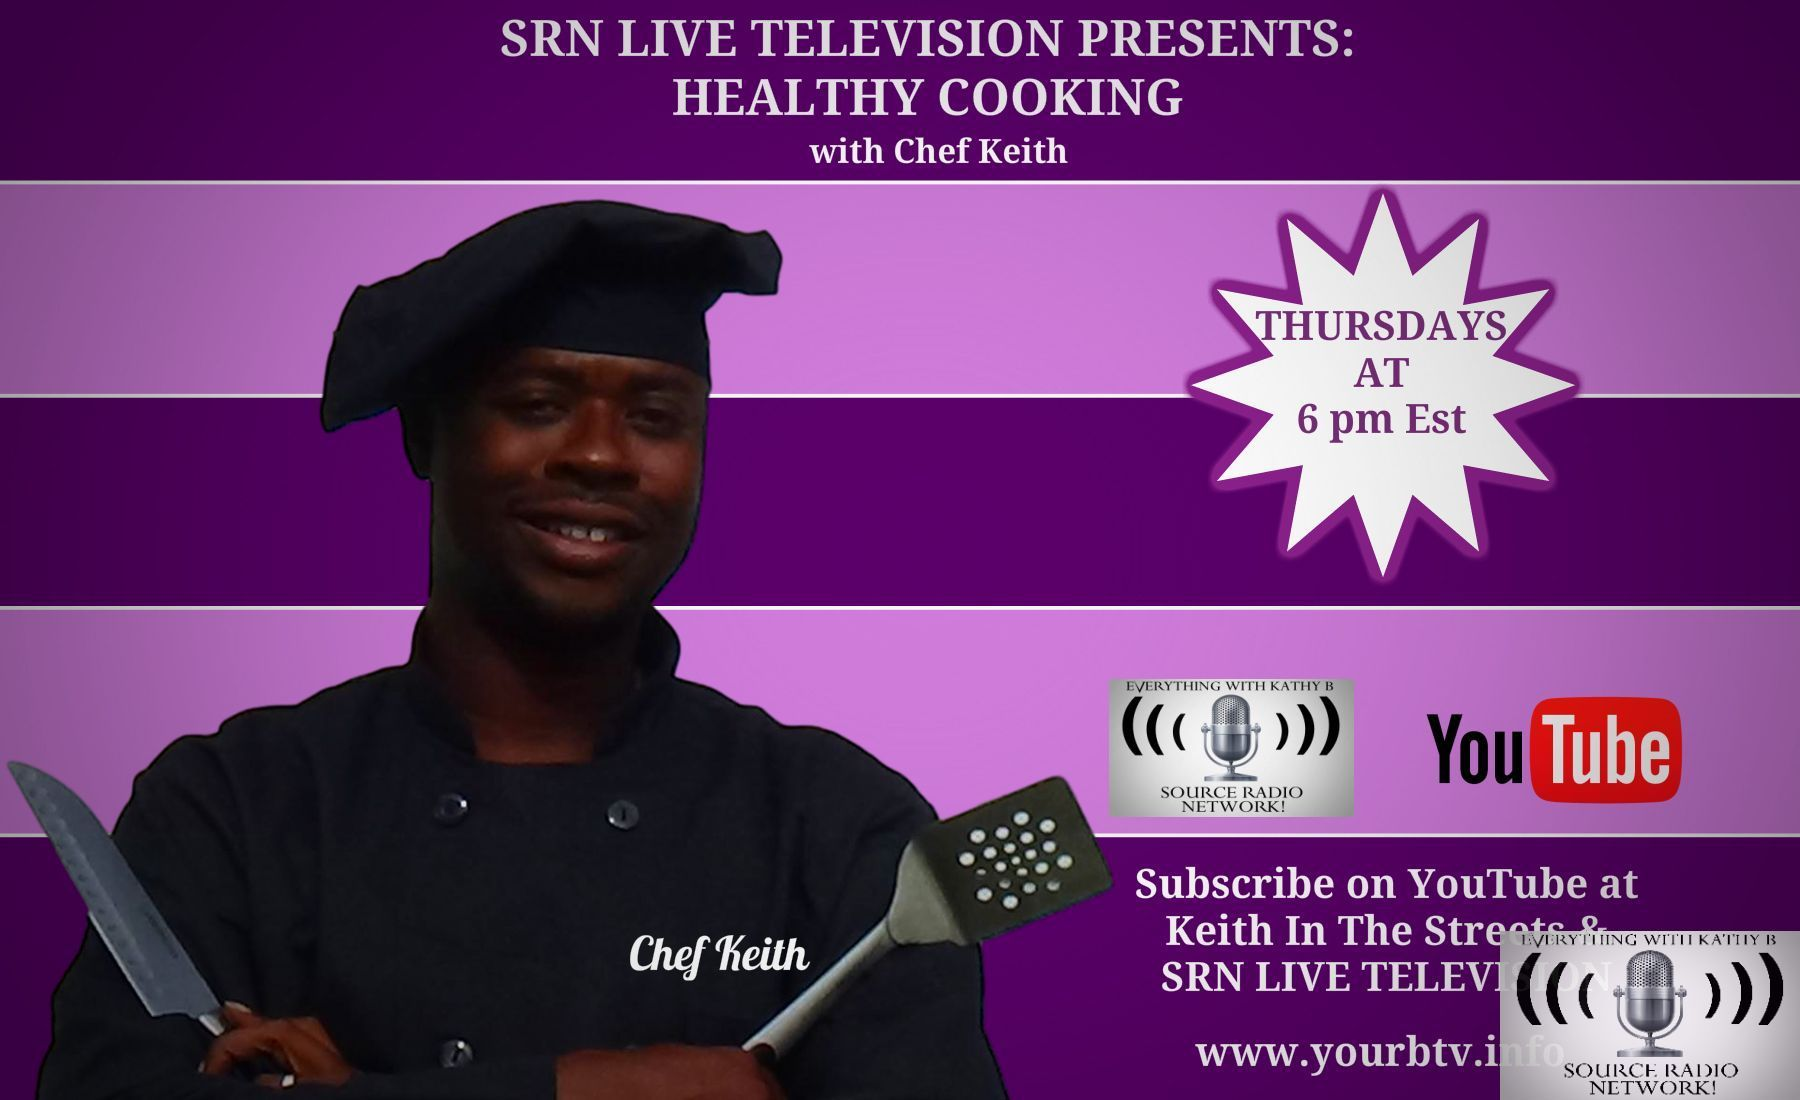 Source Nation! Join us tonight at 6 Est for SRN Live